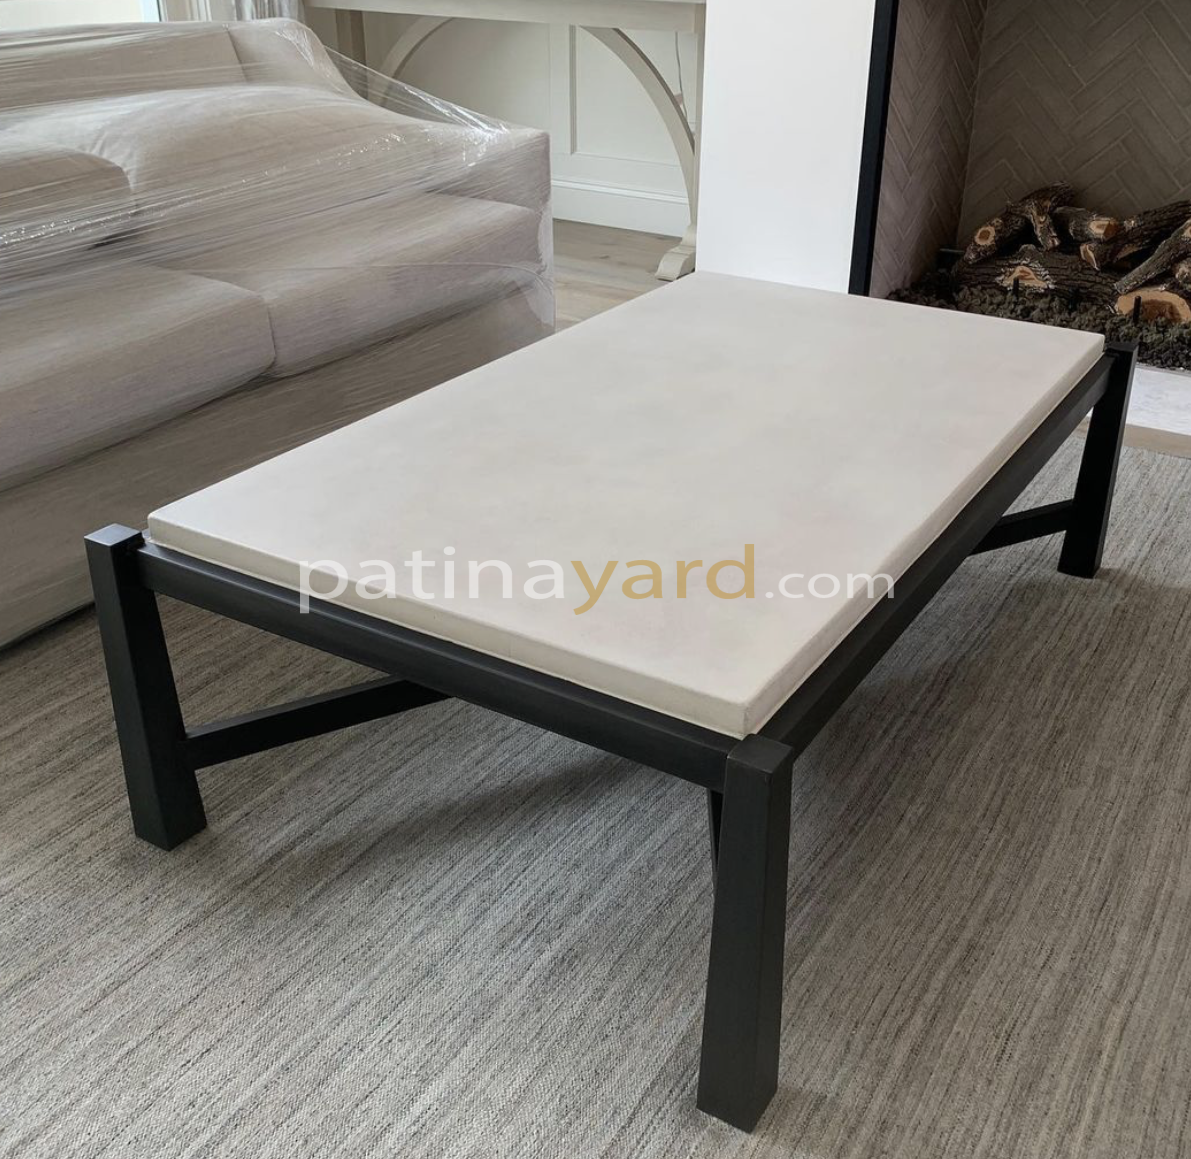 white concrete and black metal coffee table